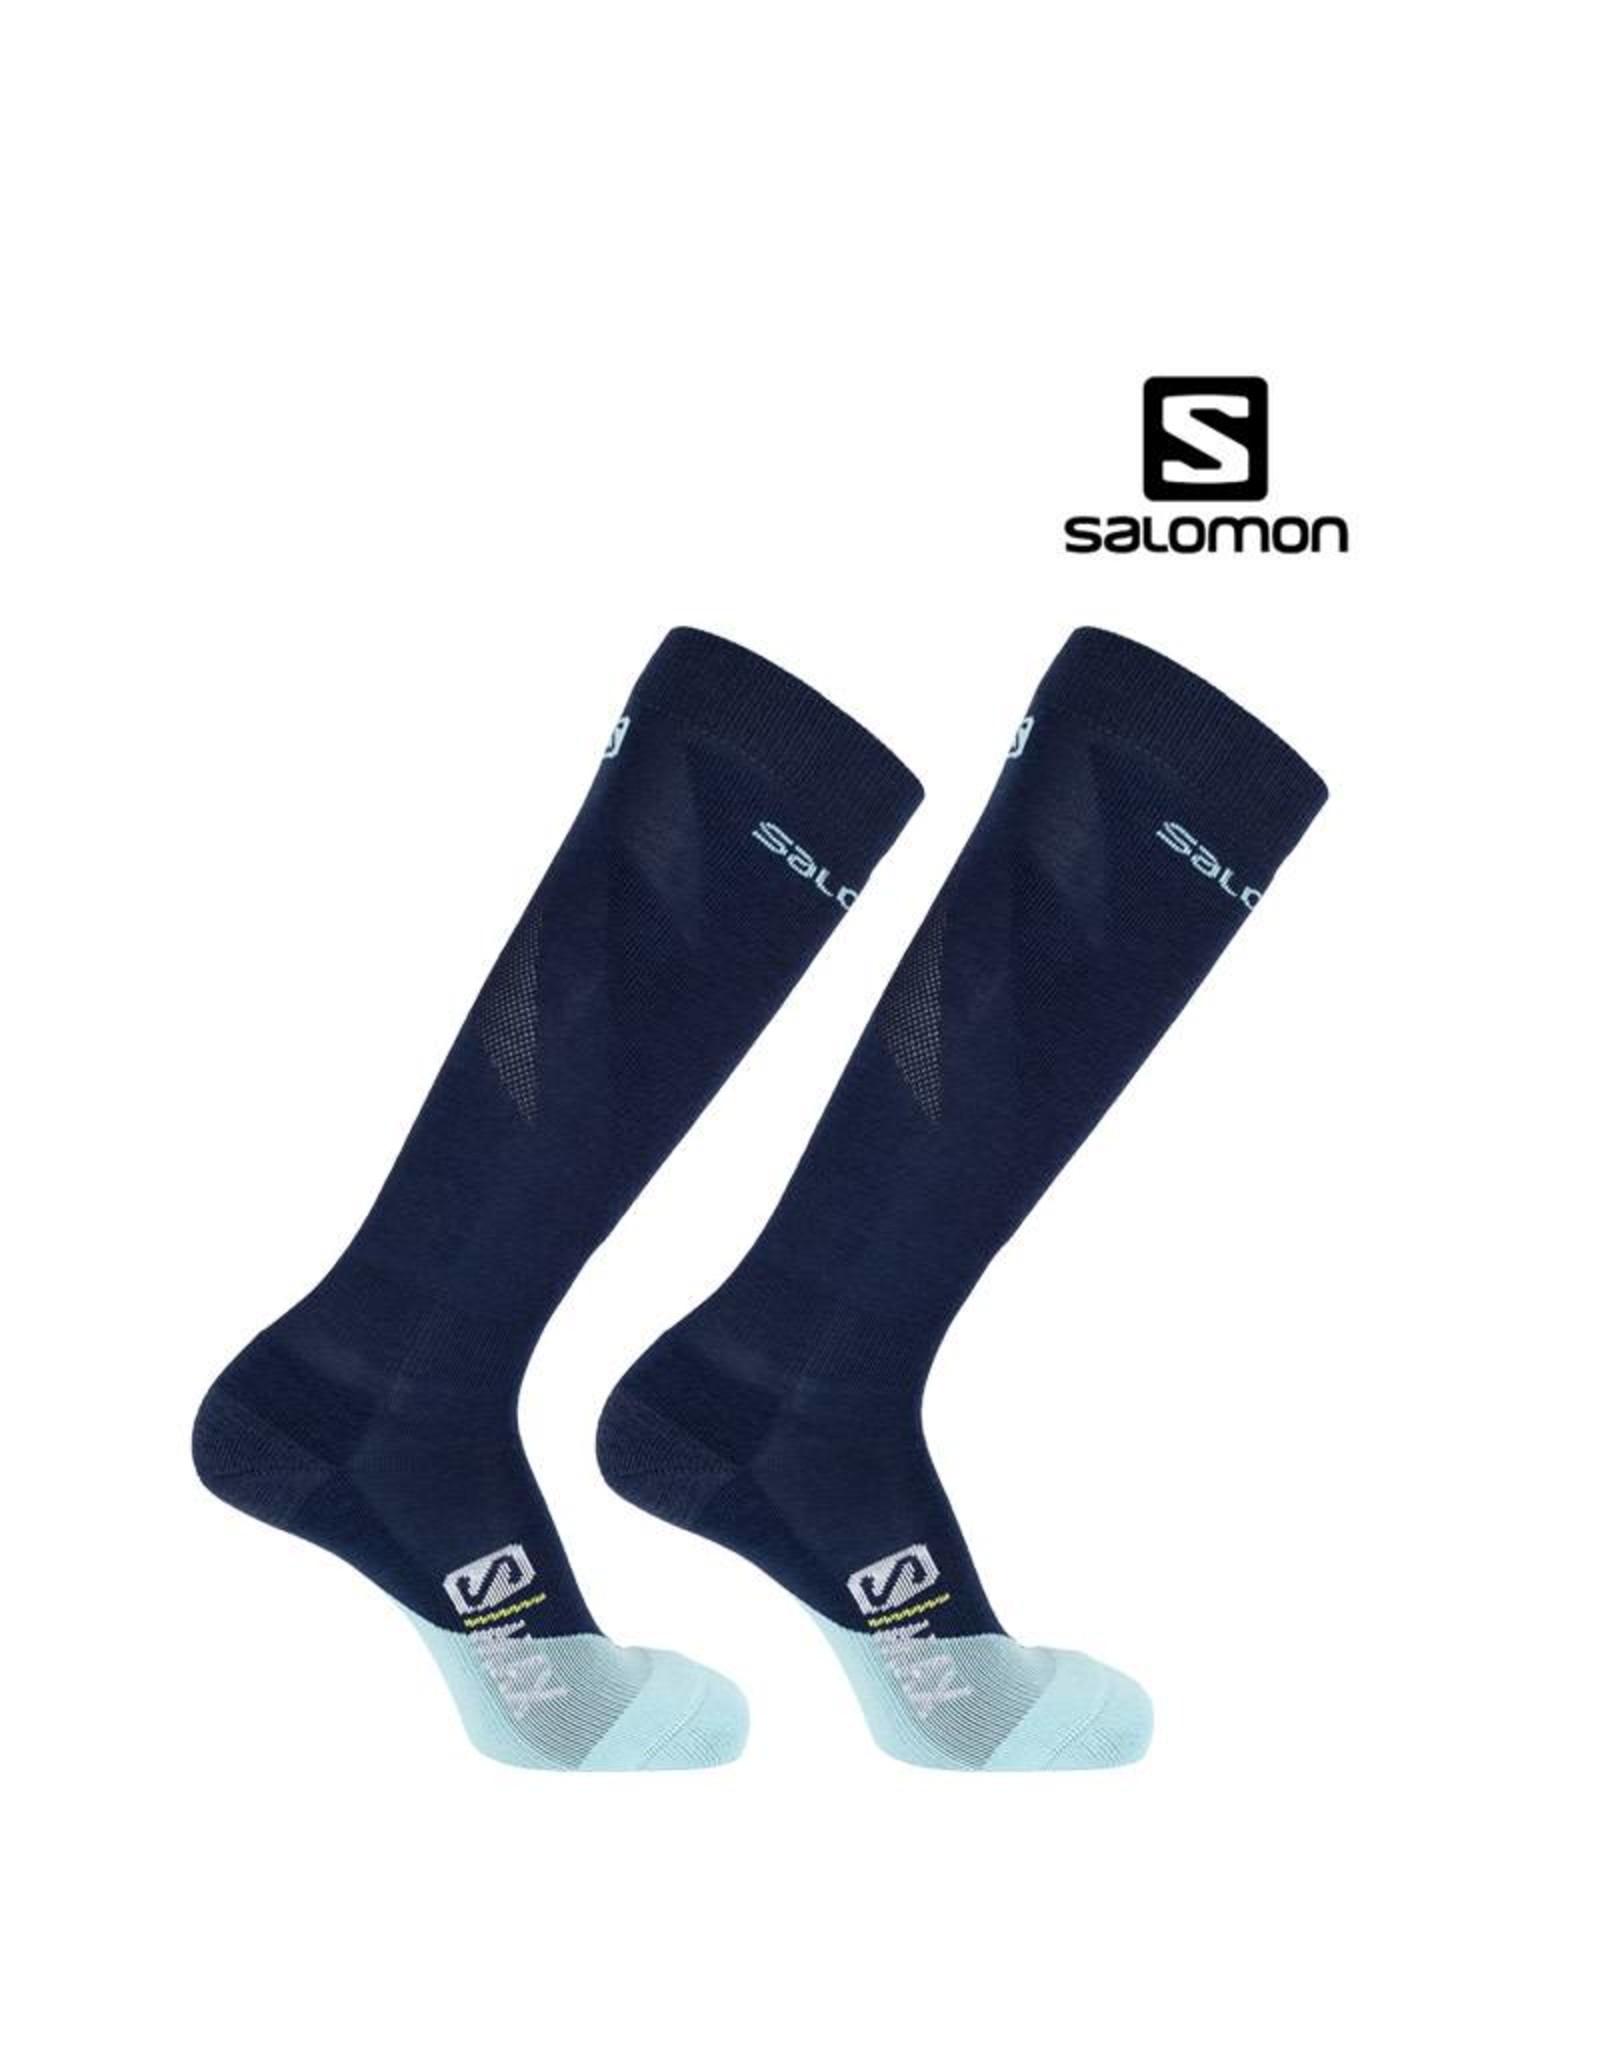 SALOMON SALOMON SKISOKKEN S/MAX Women Blue/Aruba Blue 39-41